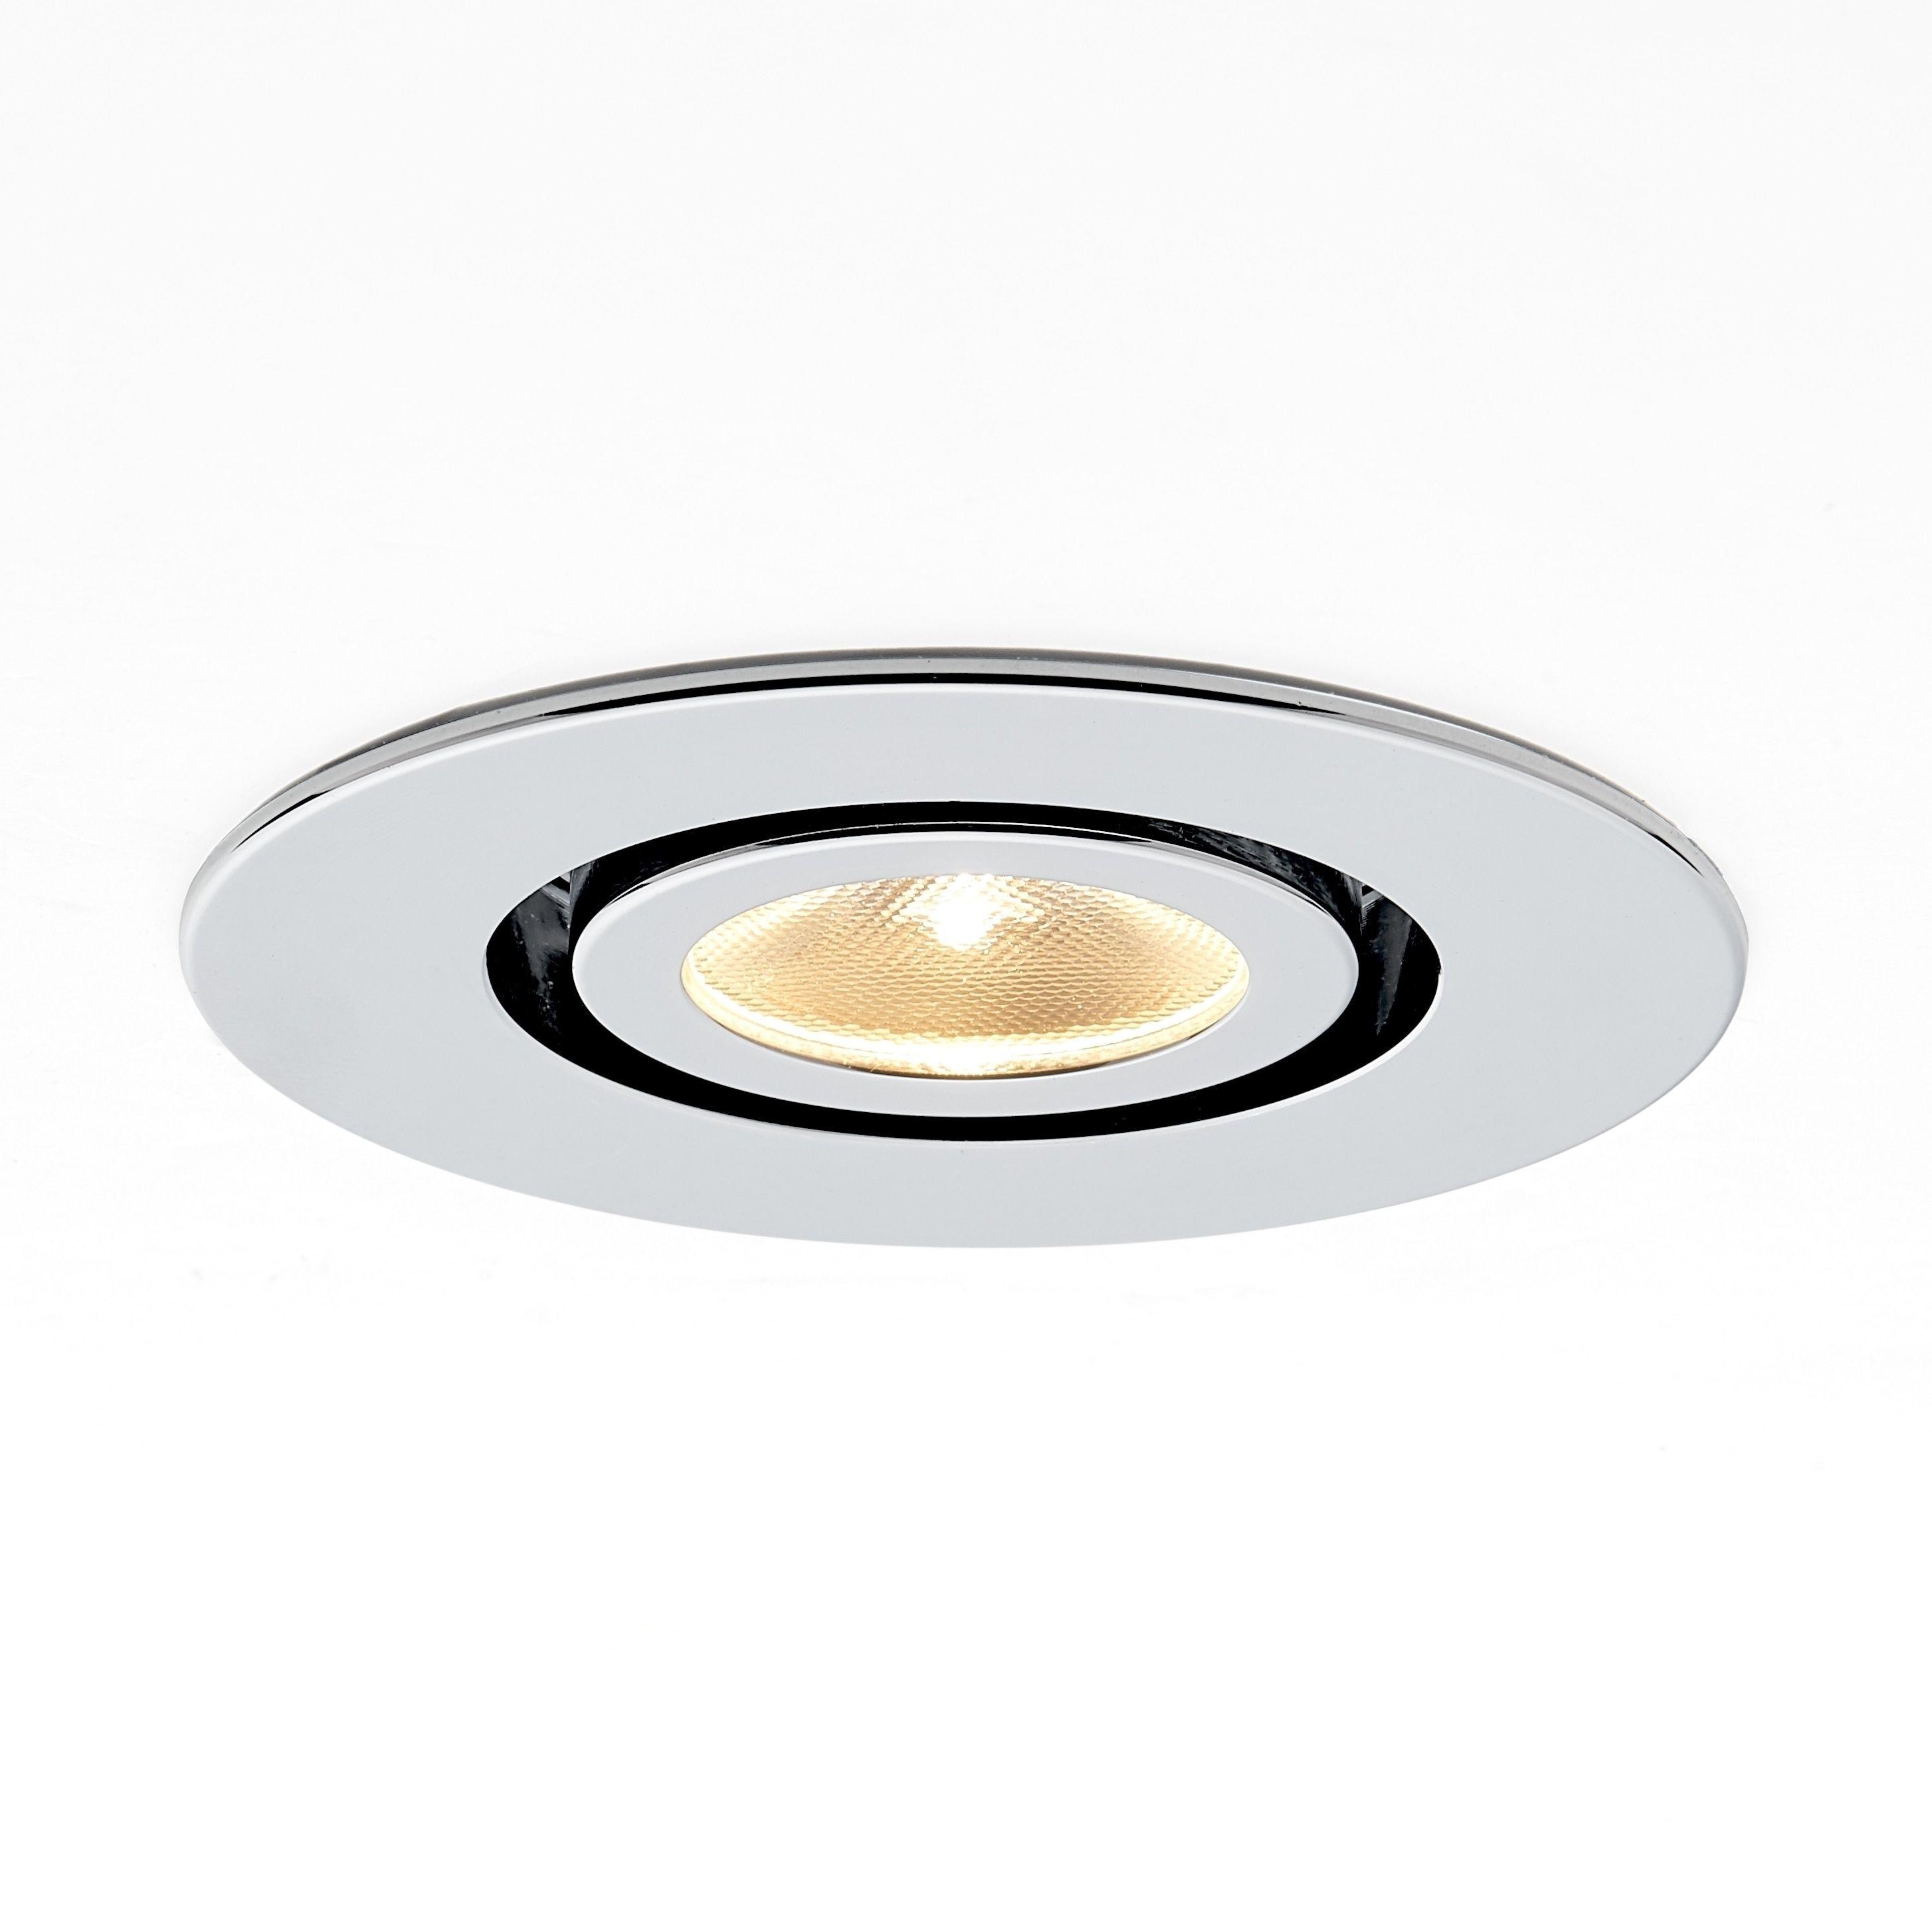 Molto Luce Kado Silver Metal Tiltable LED 30-degree 5000K Recessed ...